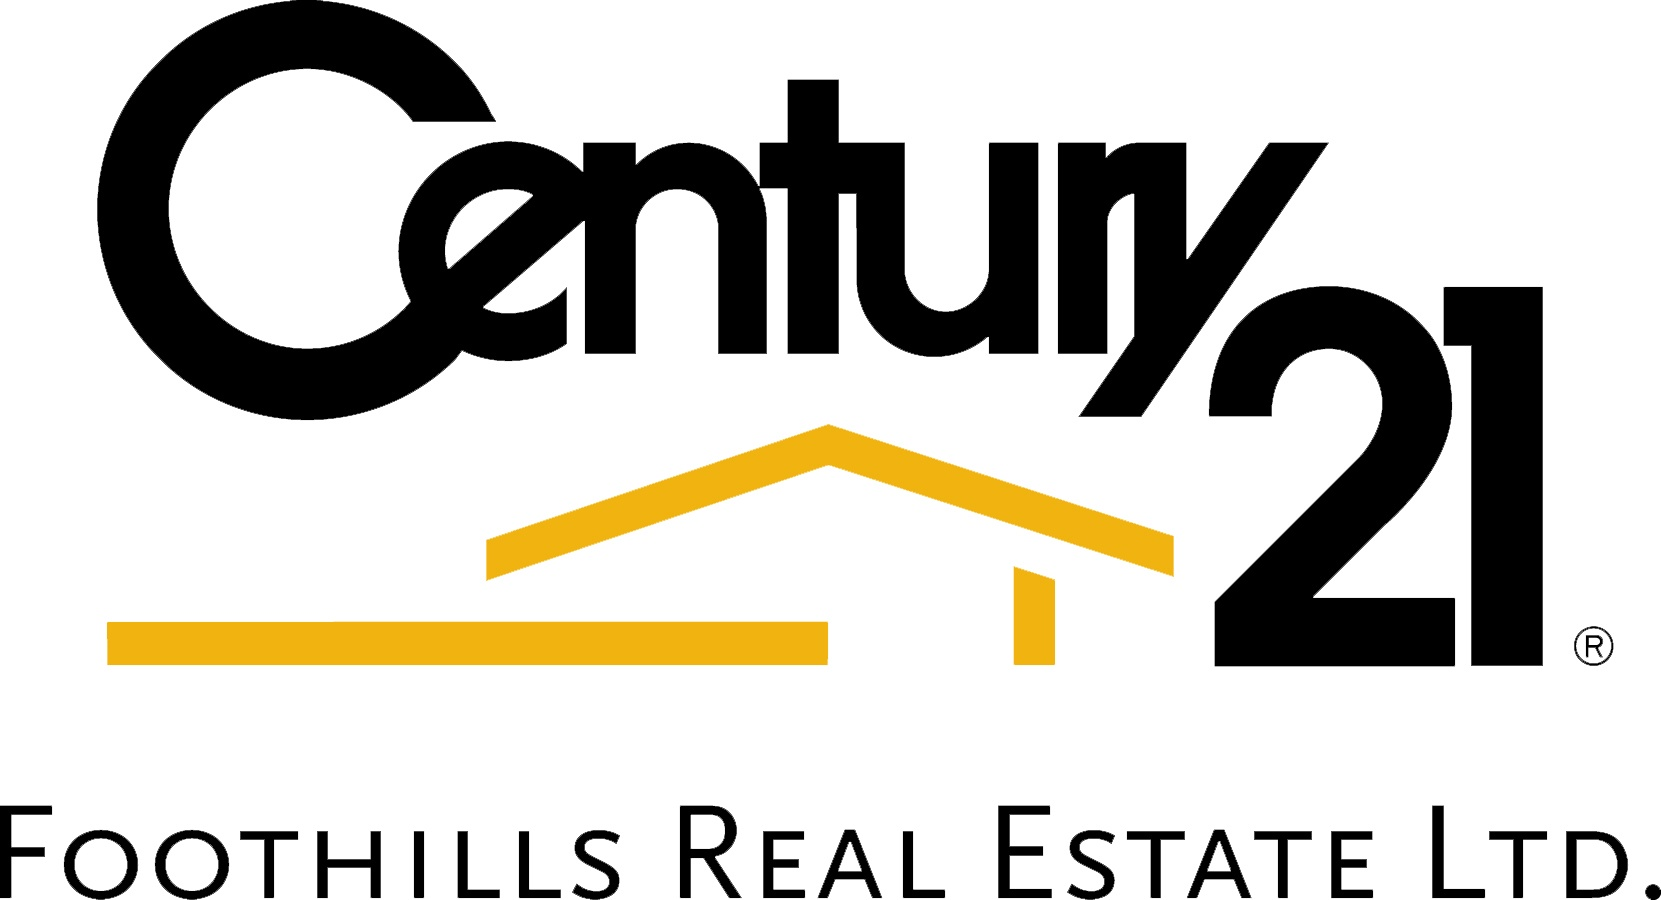 C21Foothills_Real_Estate no bacground.jpg